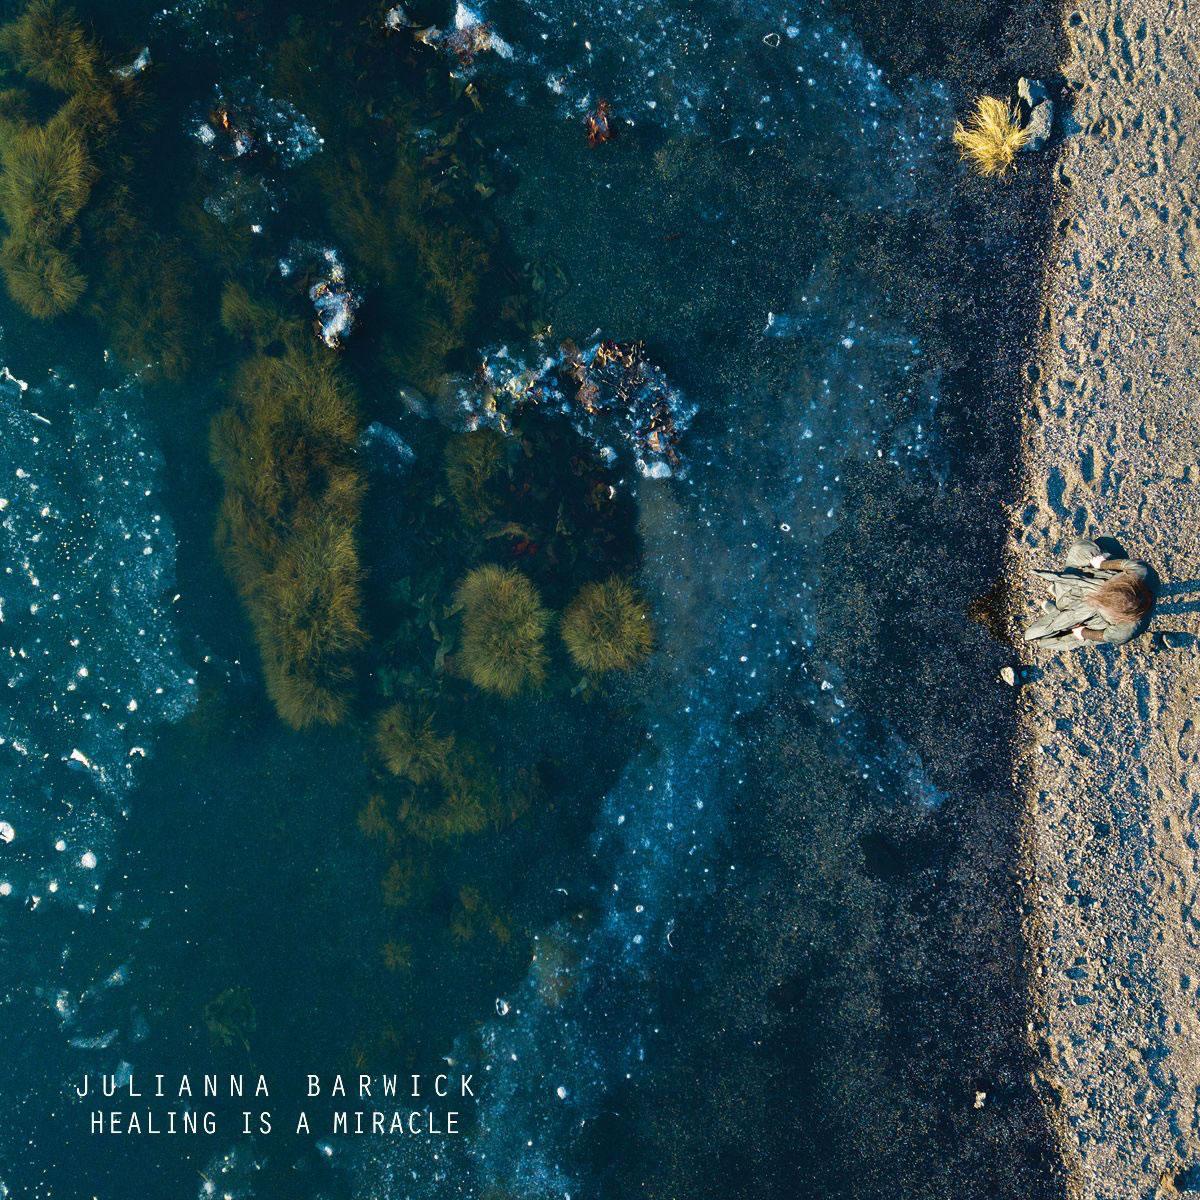 Julianna-Barwick-Healing-is-A-Miracle.jpg